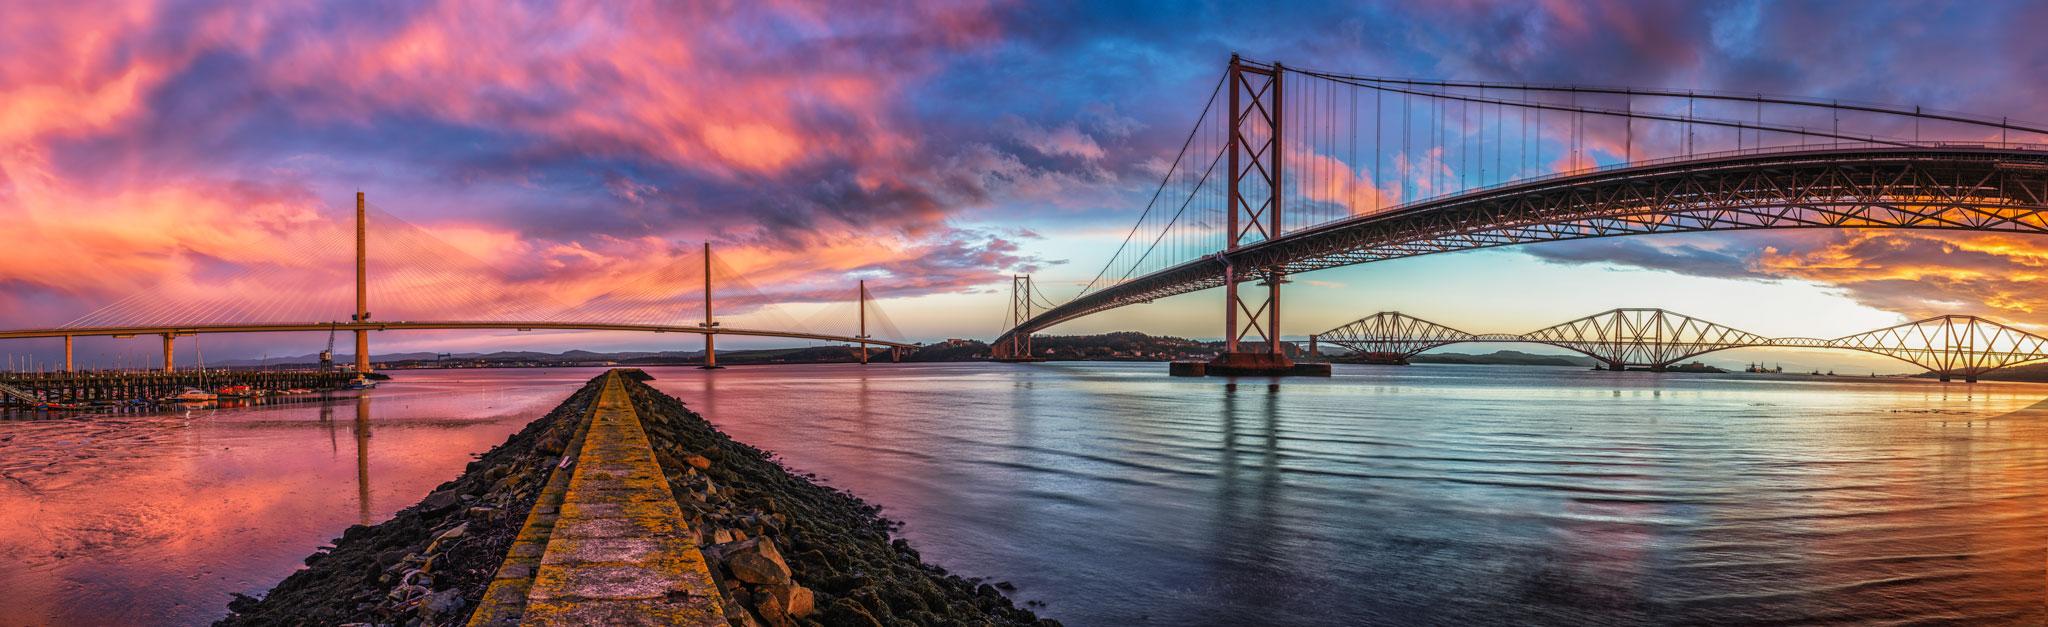 An insane sunrise over the Three Bridges.